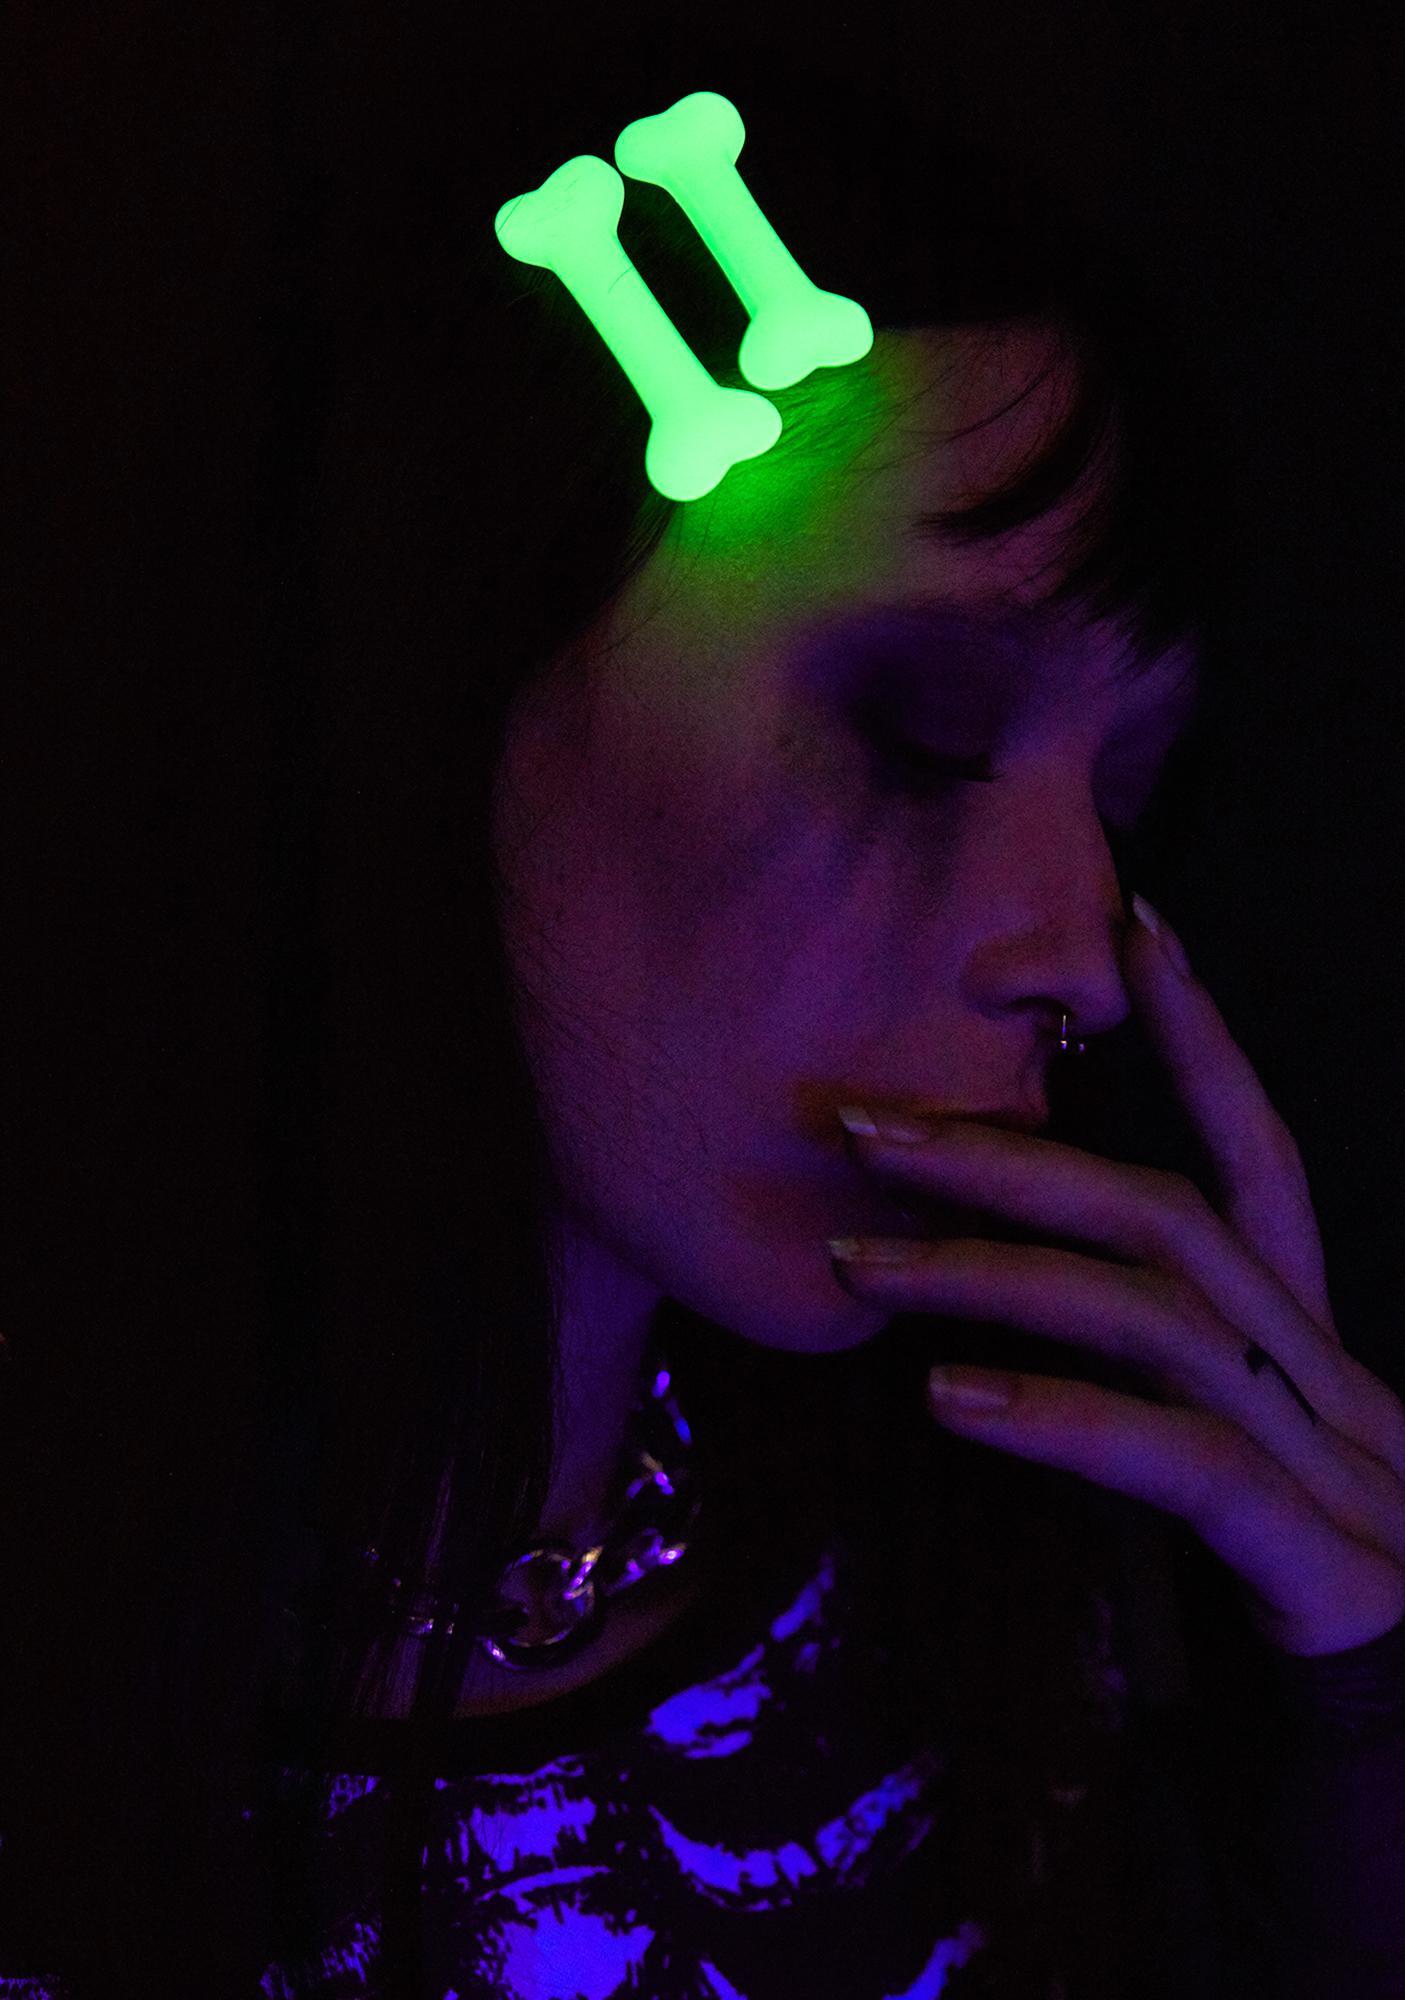 Kreepsville 666 Mini Bone Glow In The Dark Hair Slides